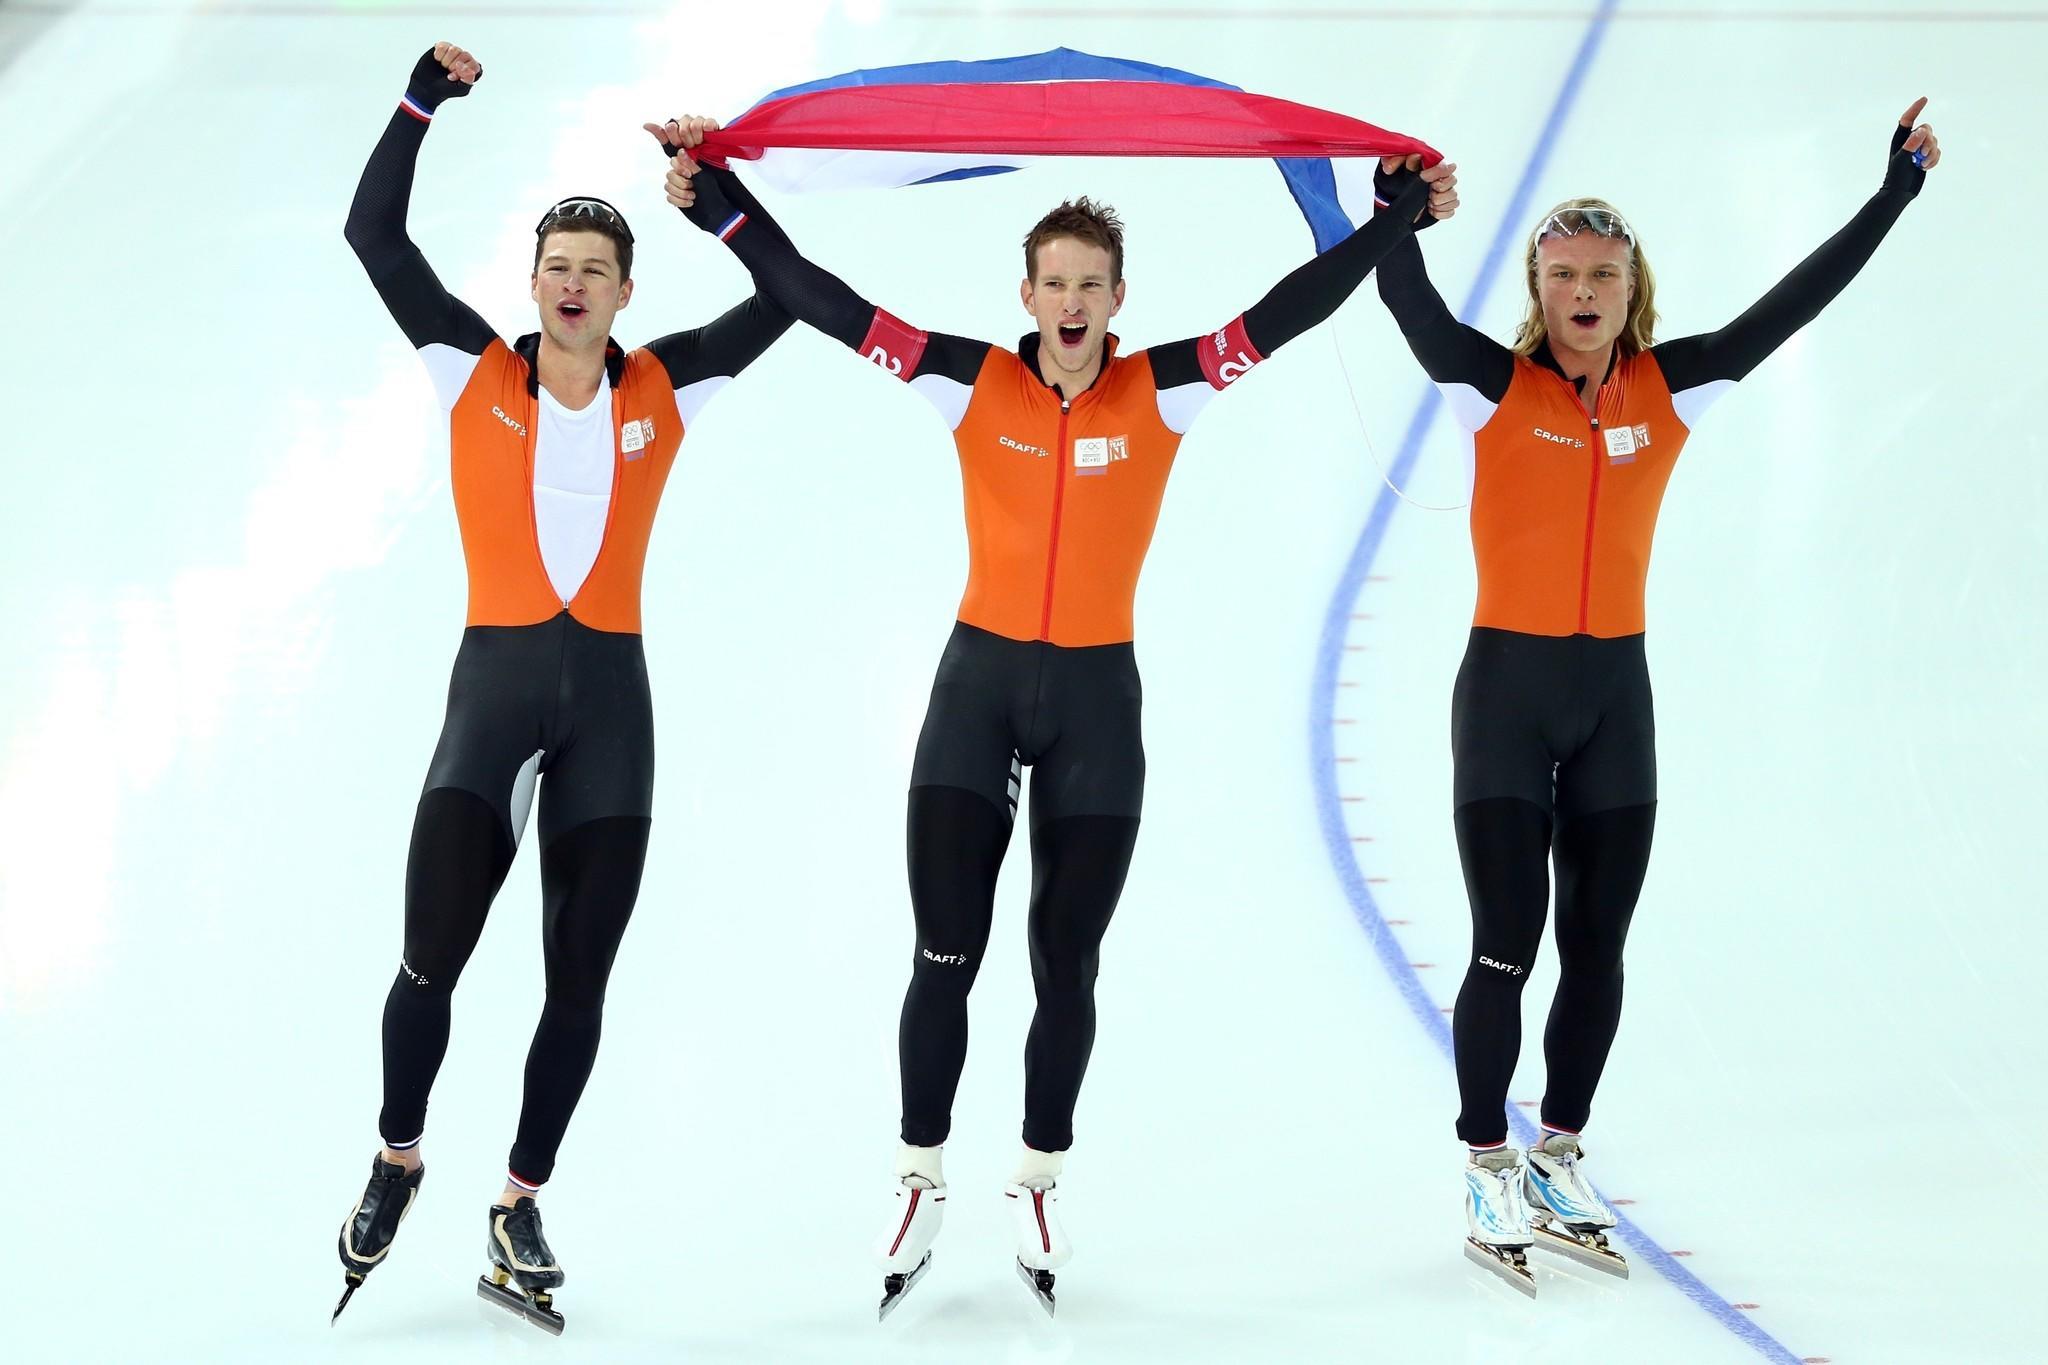 Sven Kramer, Jan Blokhuijsen and Koen Verweij of the Netherland celebrate winning the gold medal during the Men's Team Pursuit Saturday.